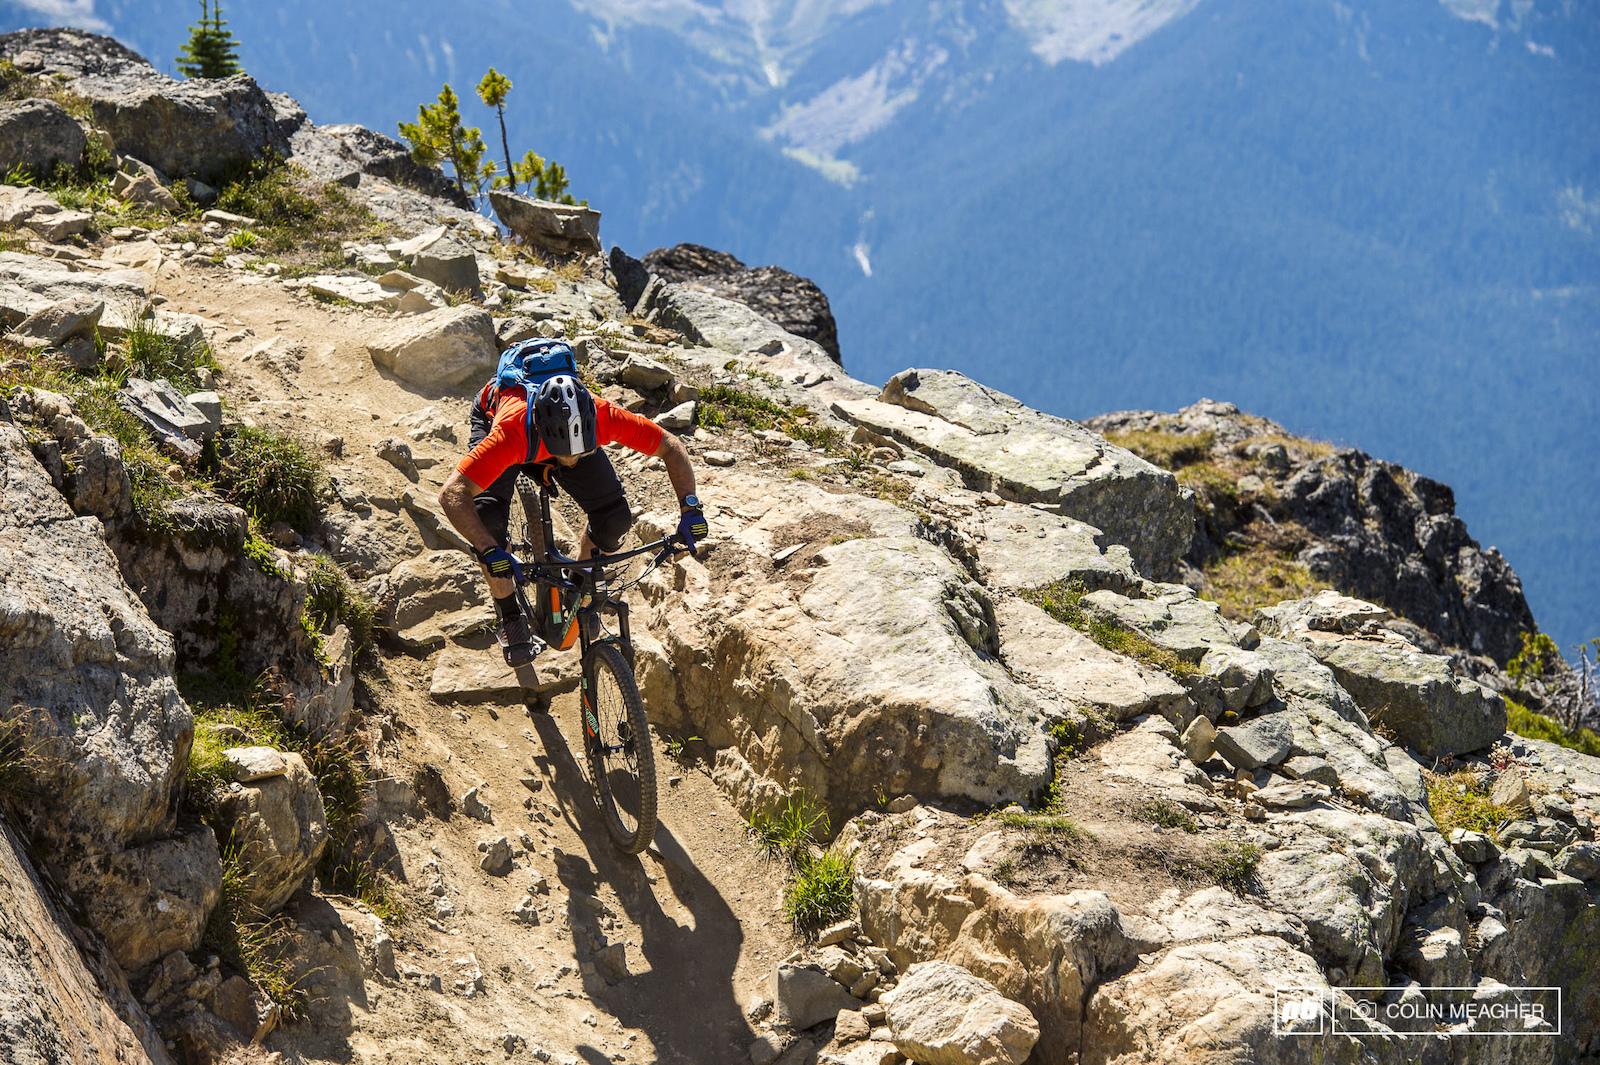 Vernon Felton testing the Santa Cruz Hightower on the Top of the World Trail in Whistler BC